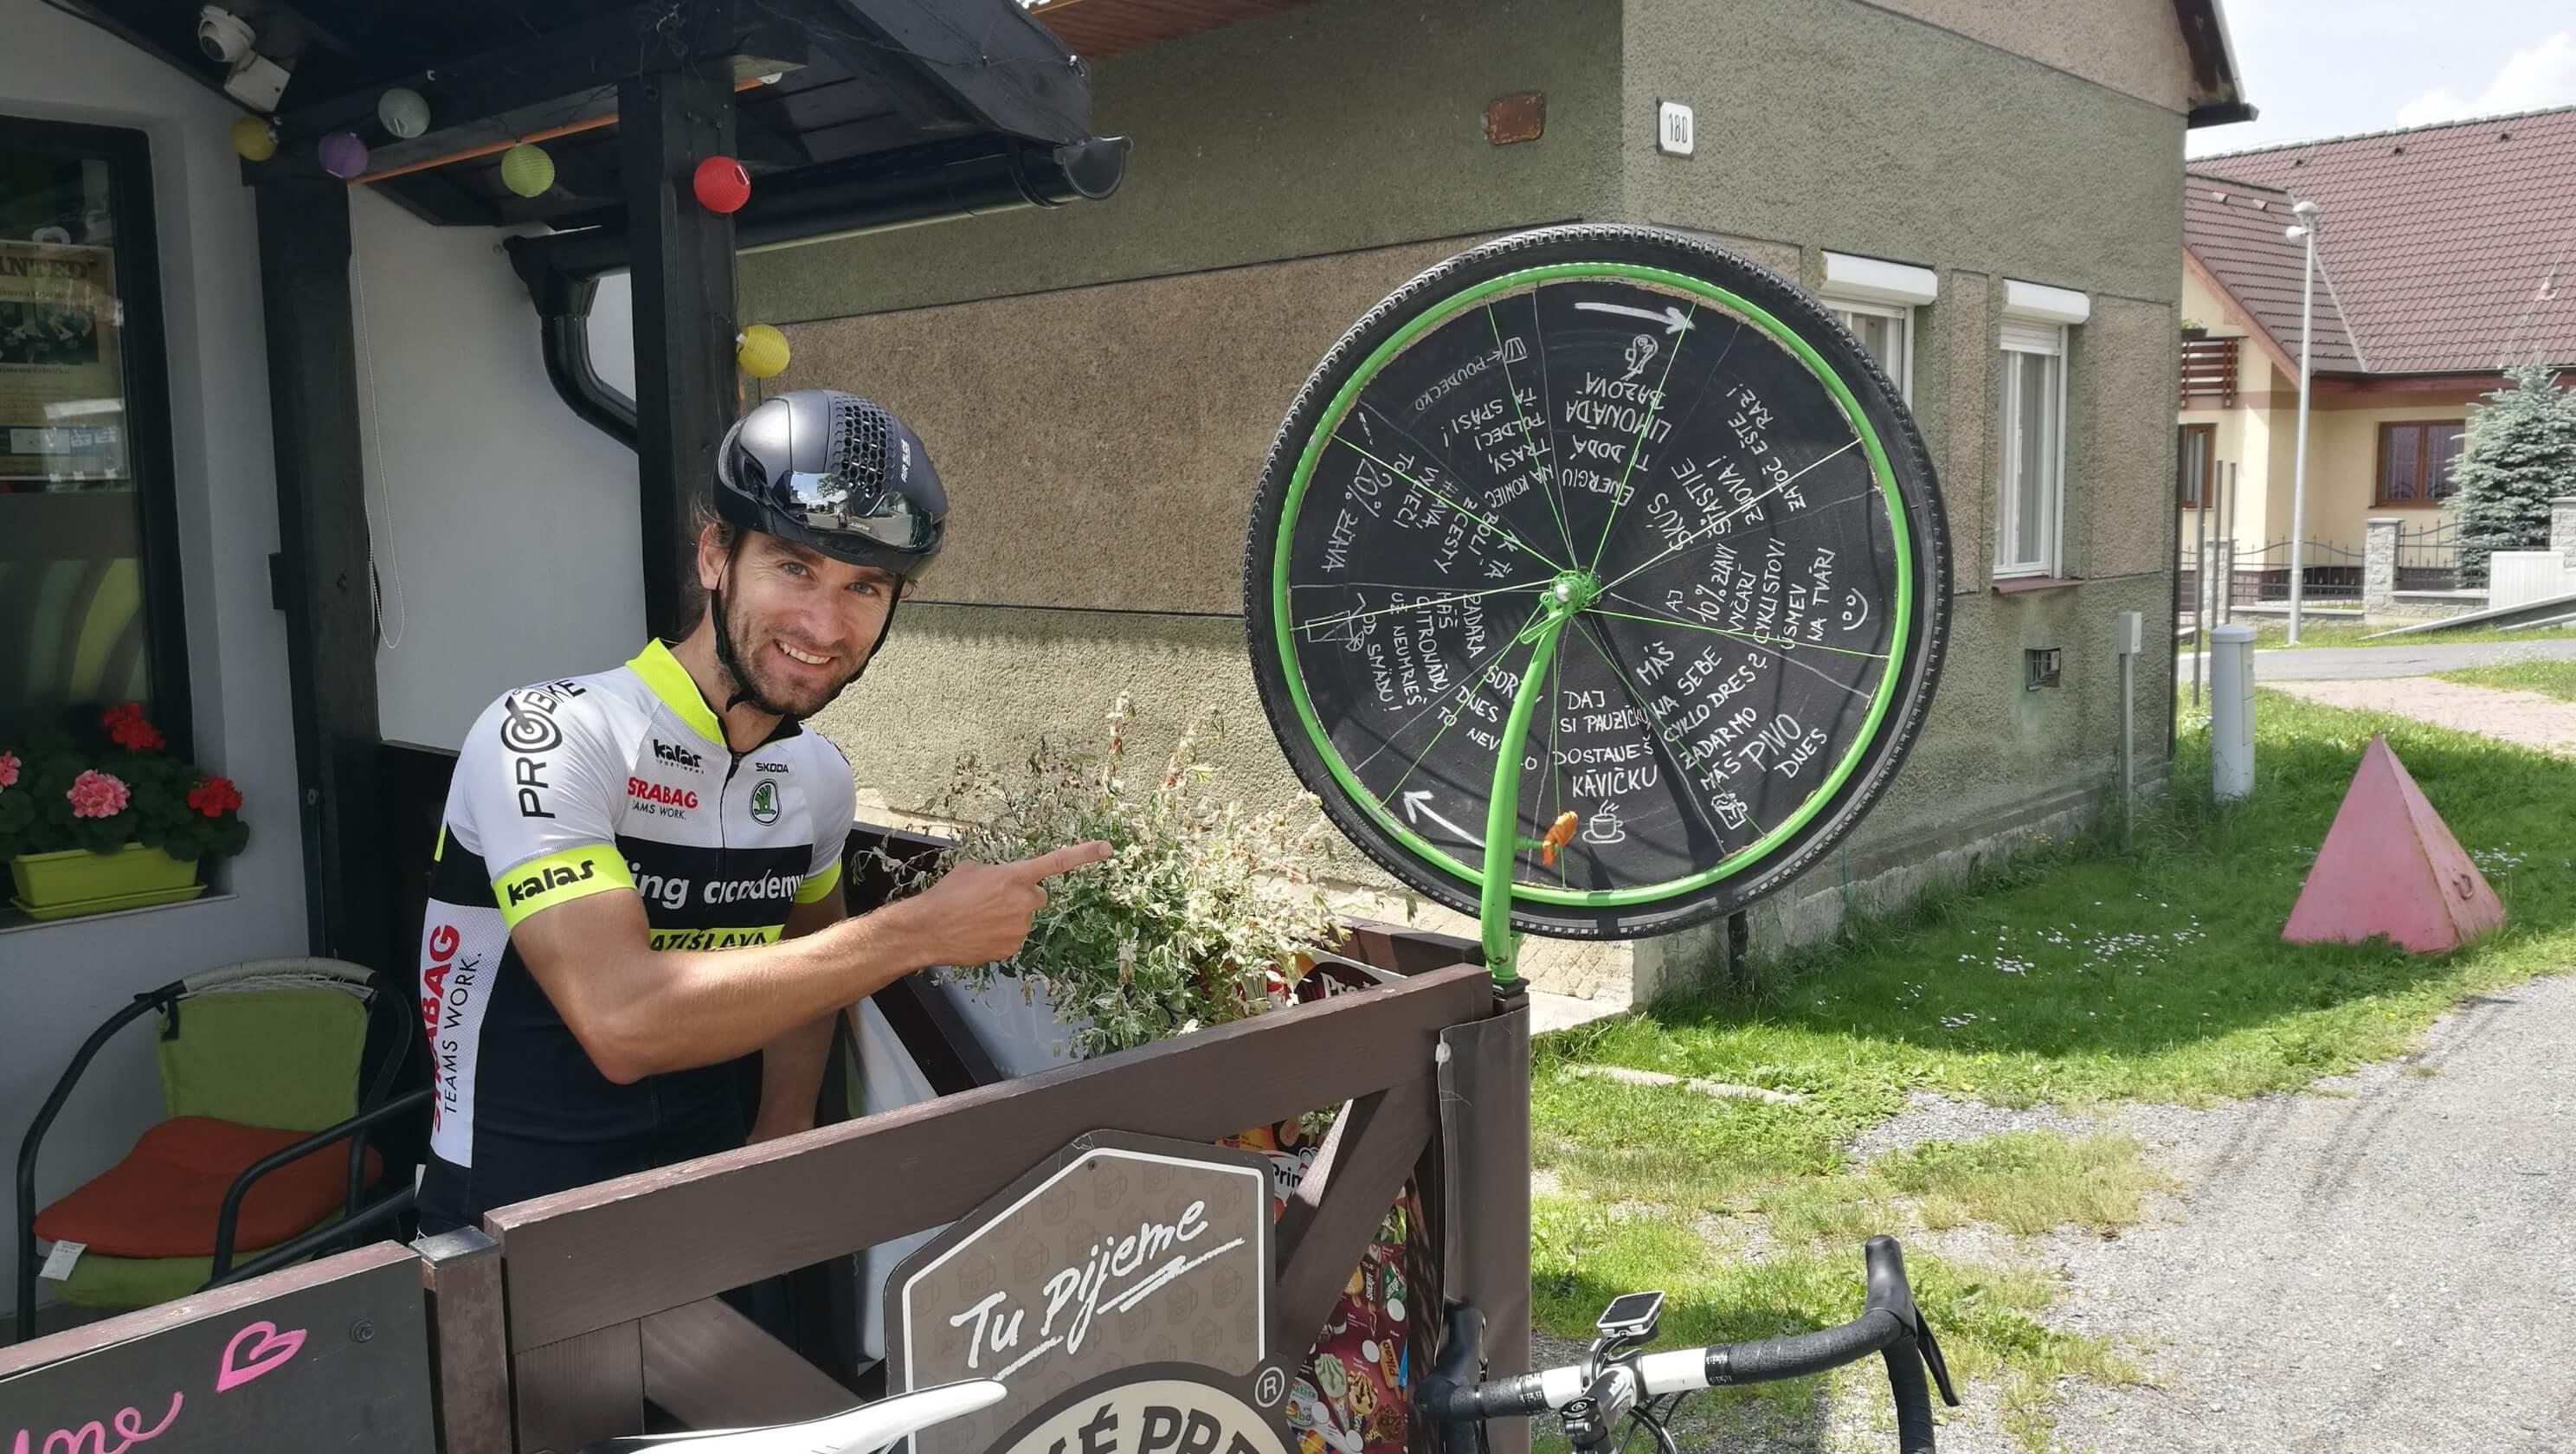 cyklosvet-sustredenie-kaviaren-strba